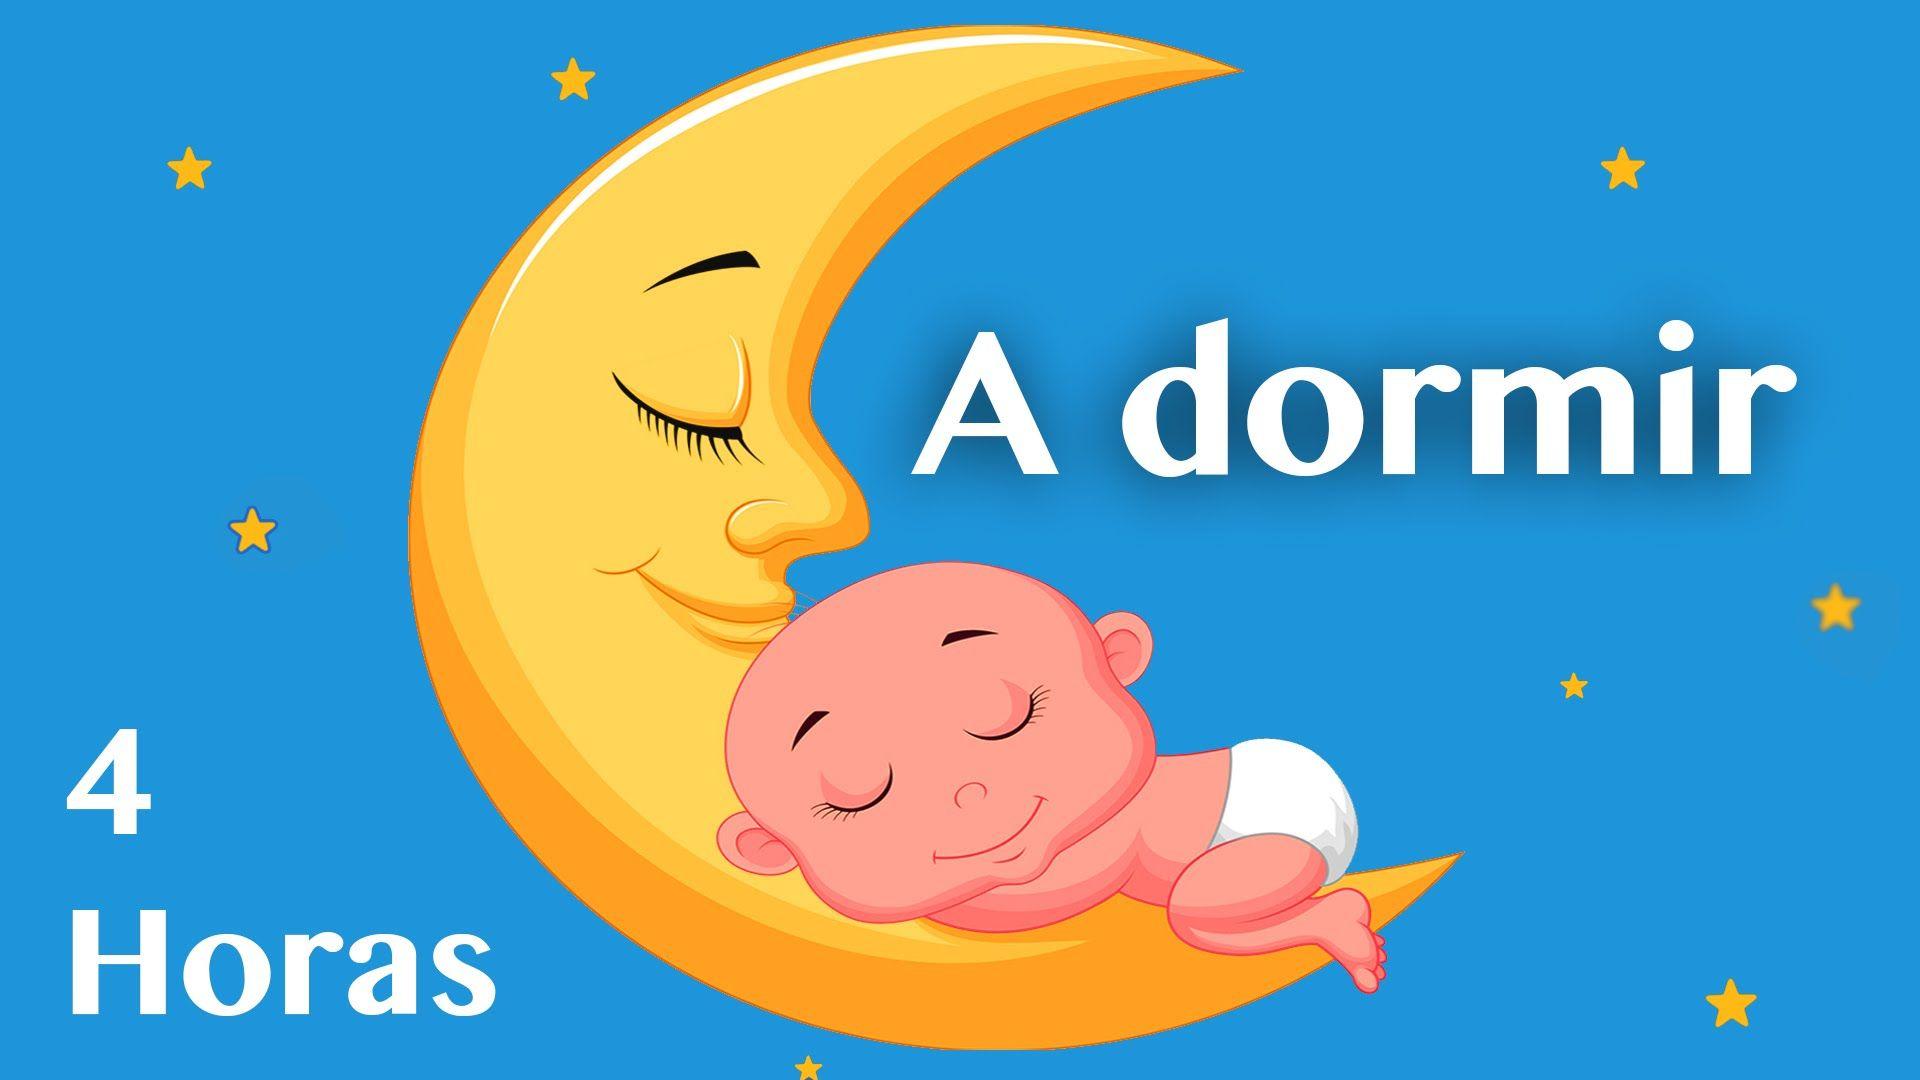 4 Horas Nana A Dormir Cancion De Cuna Relajante Para Bebes Brahms Lullaby Baby Music Relaxing Music Lullabies